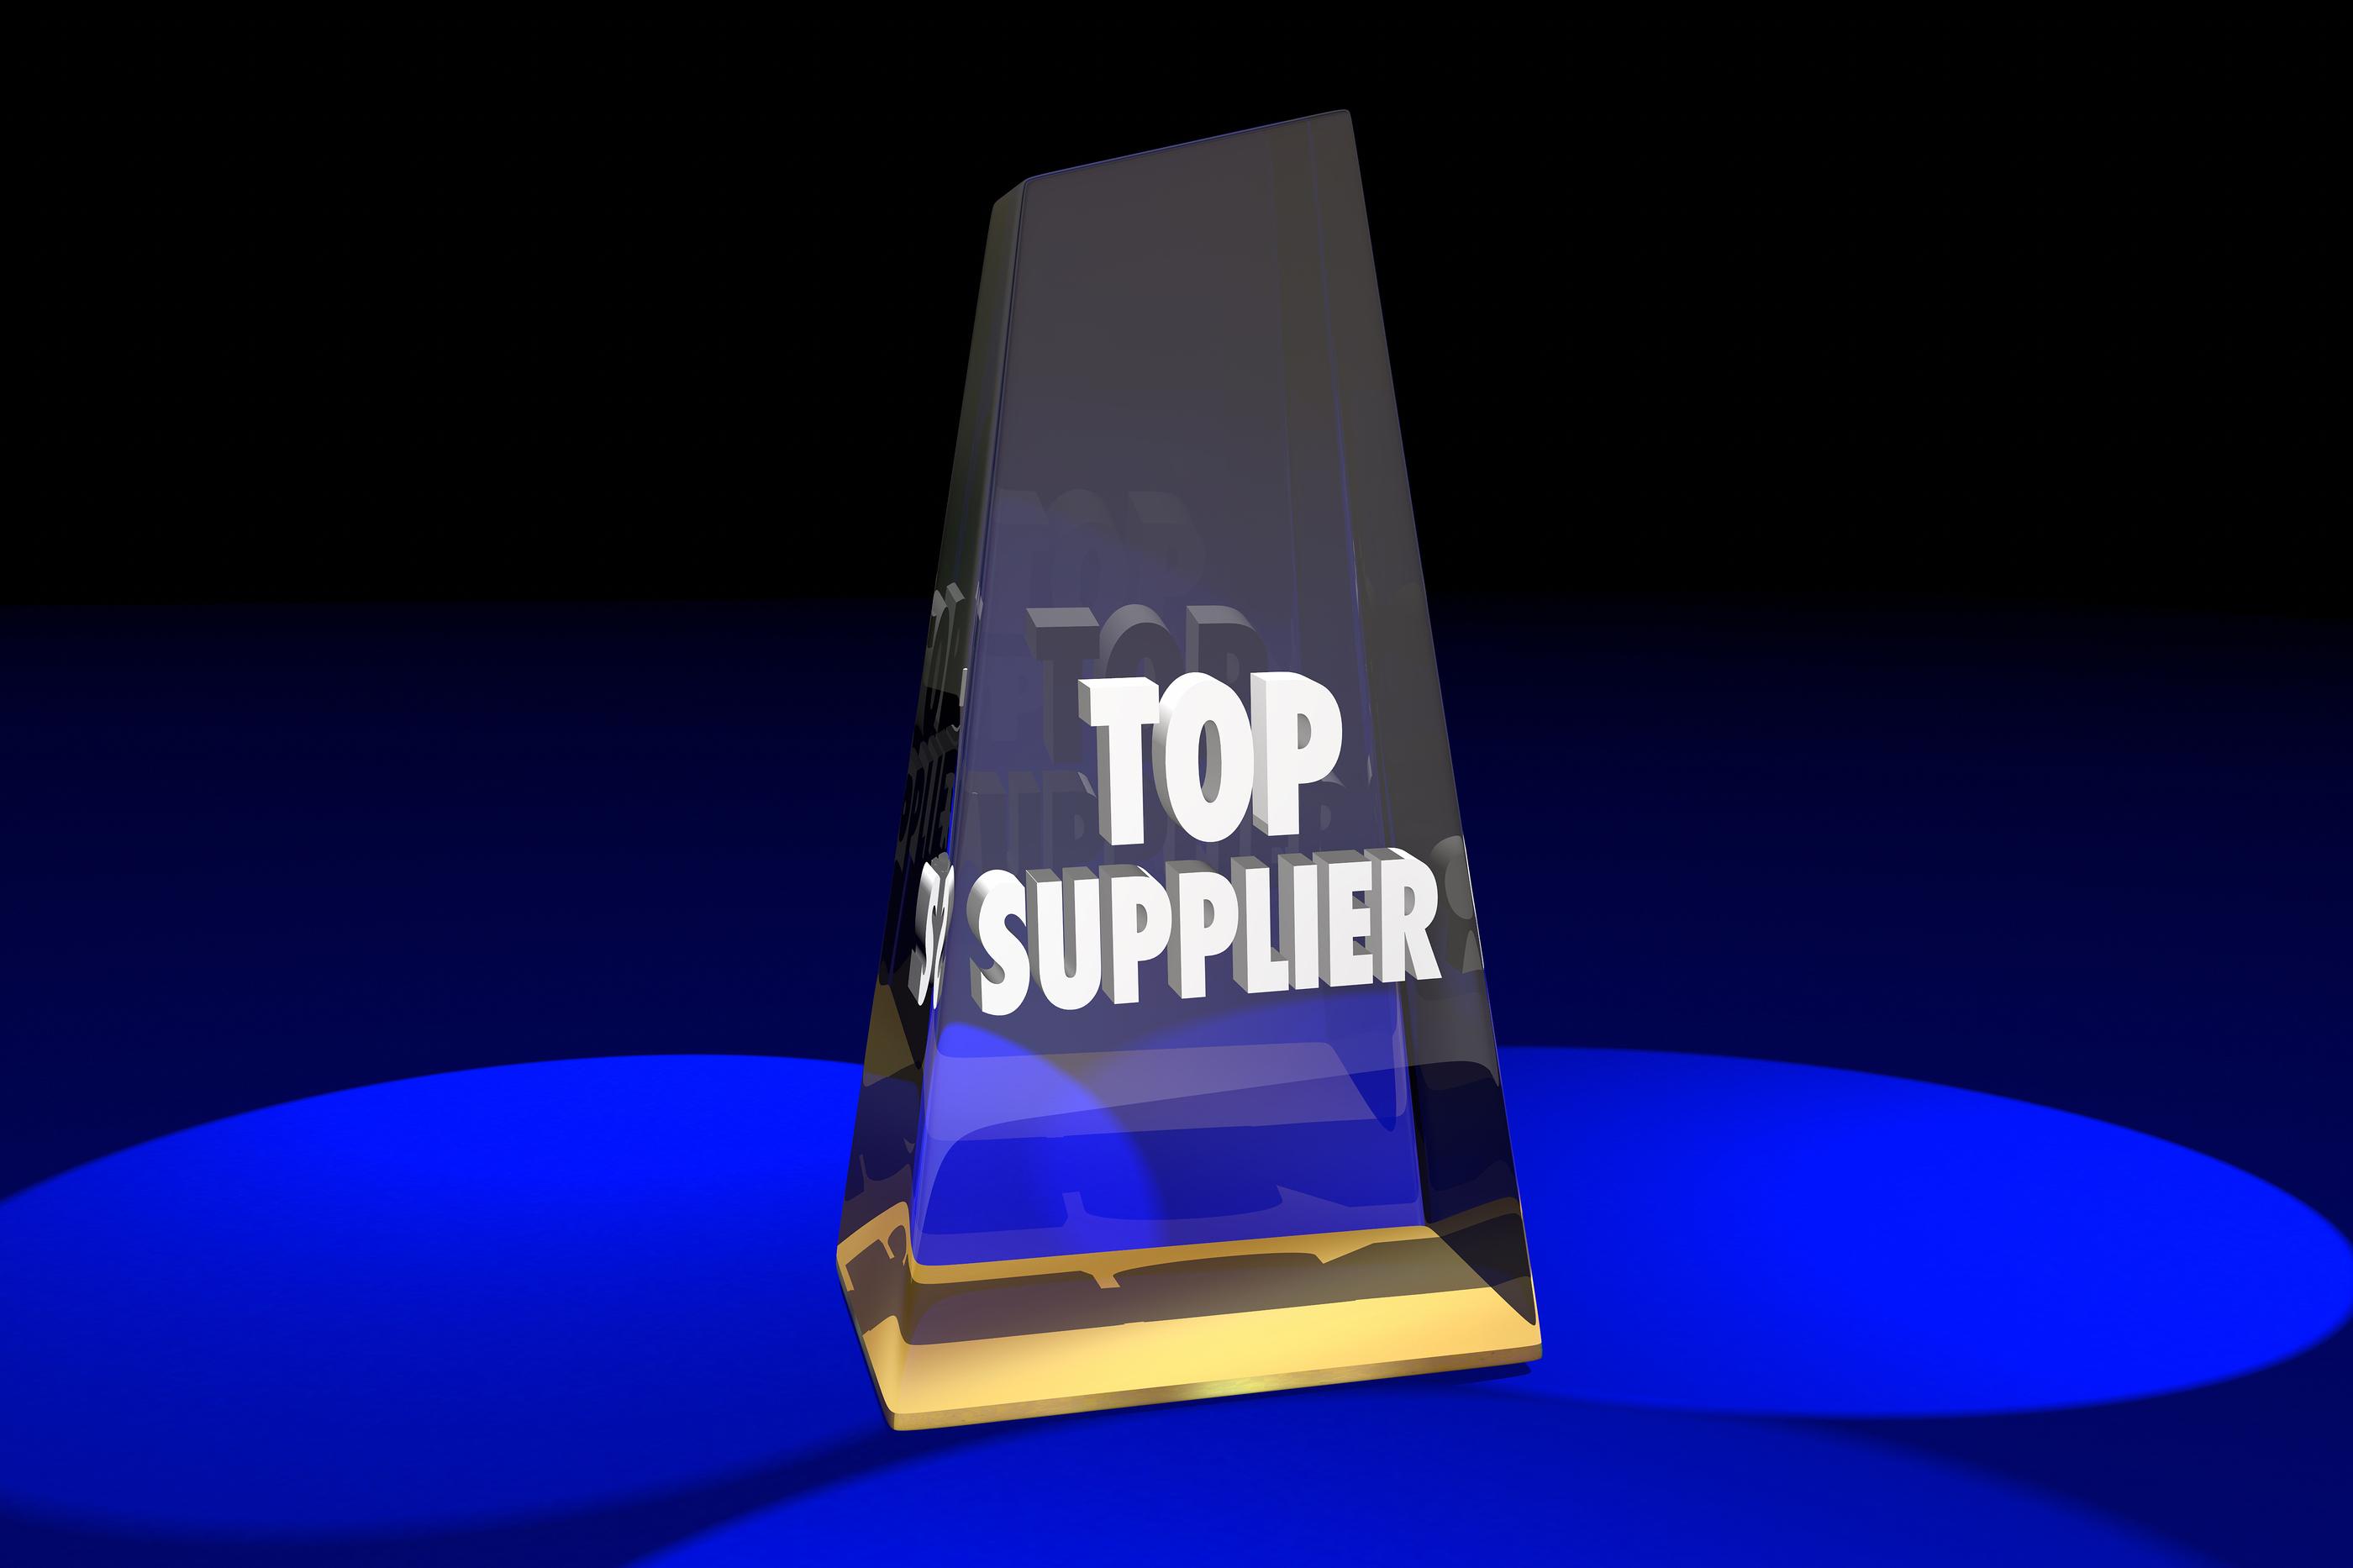 Top Supplier Vendor Provider Award Words 3d Illustration